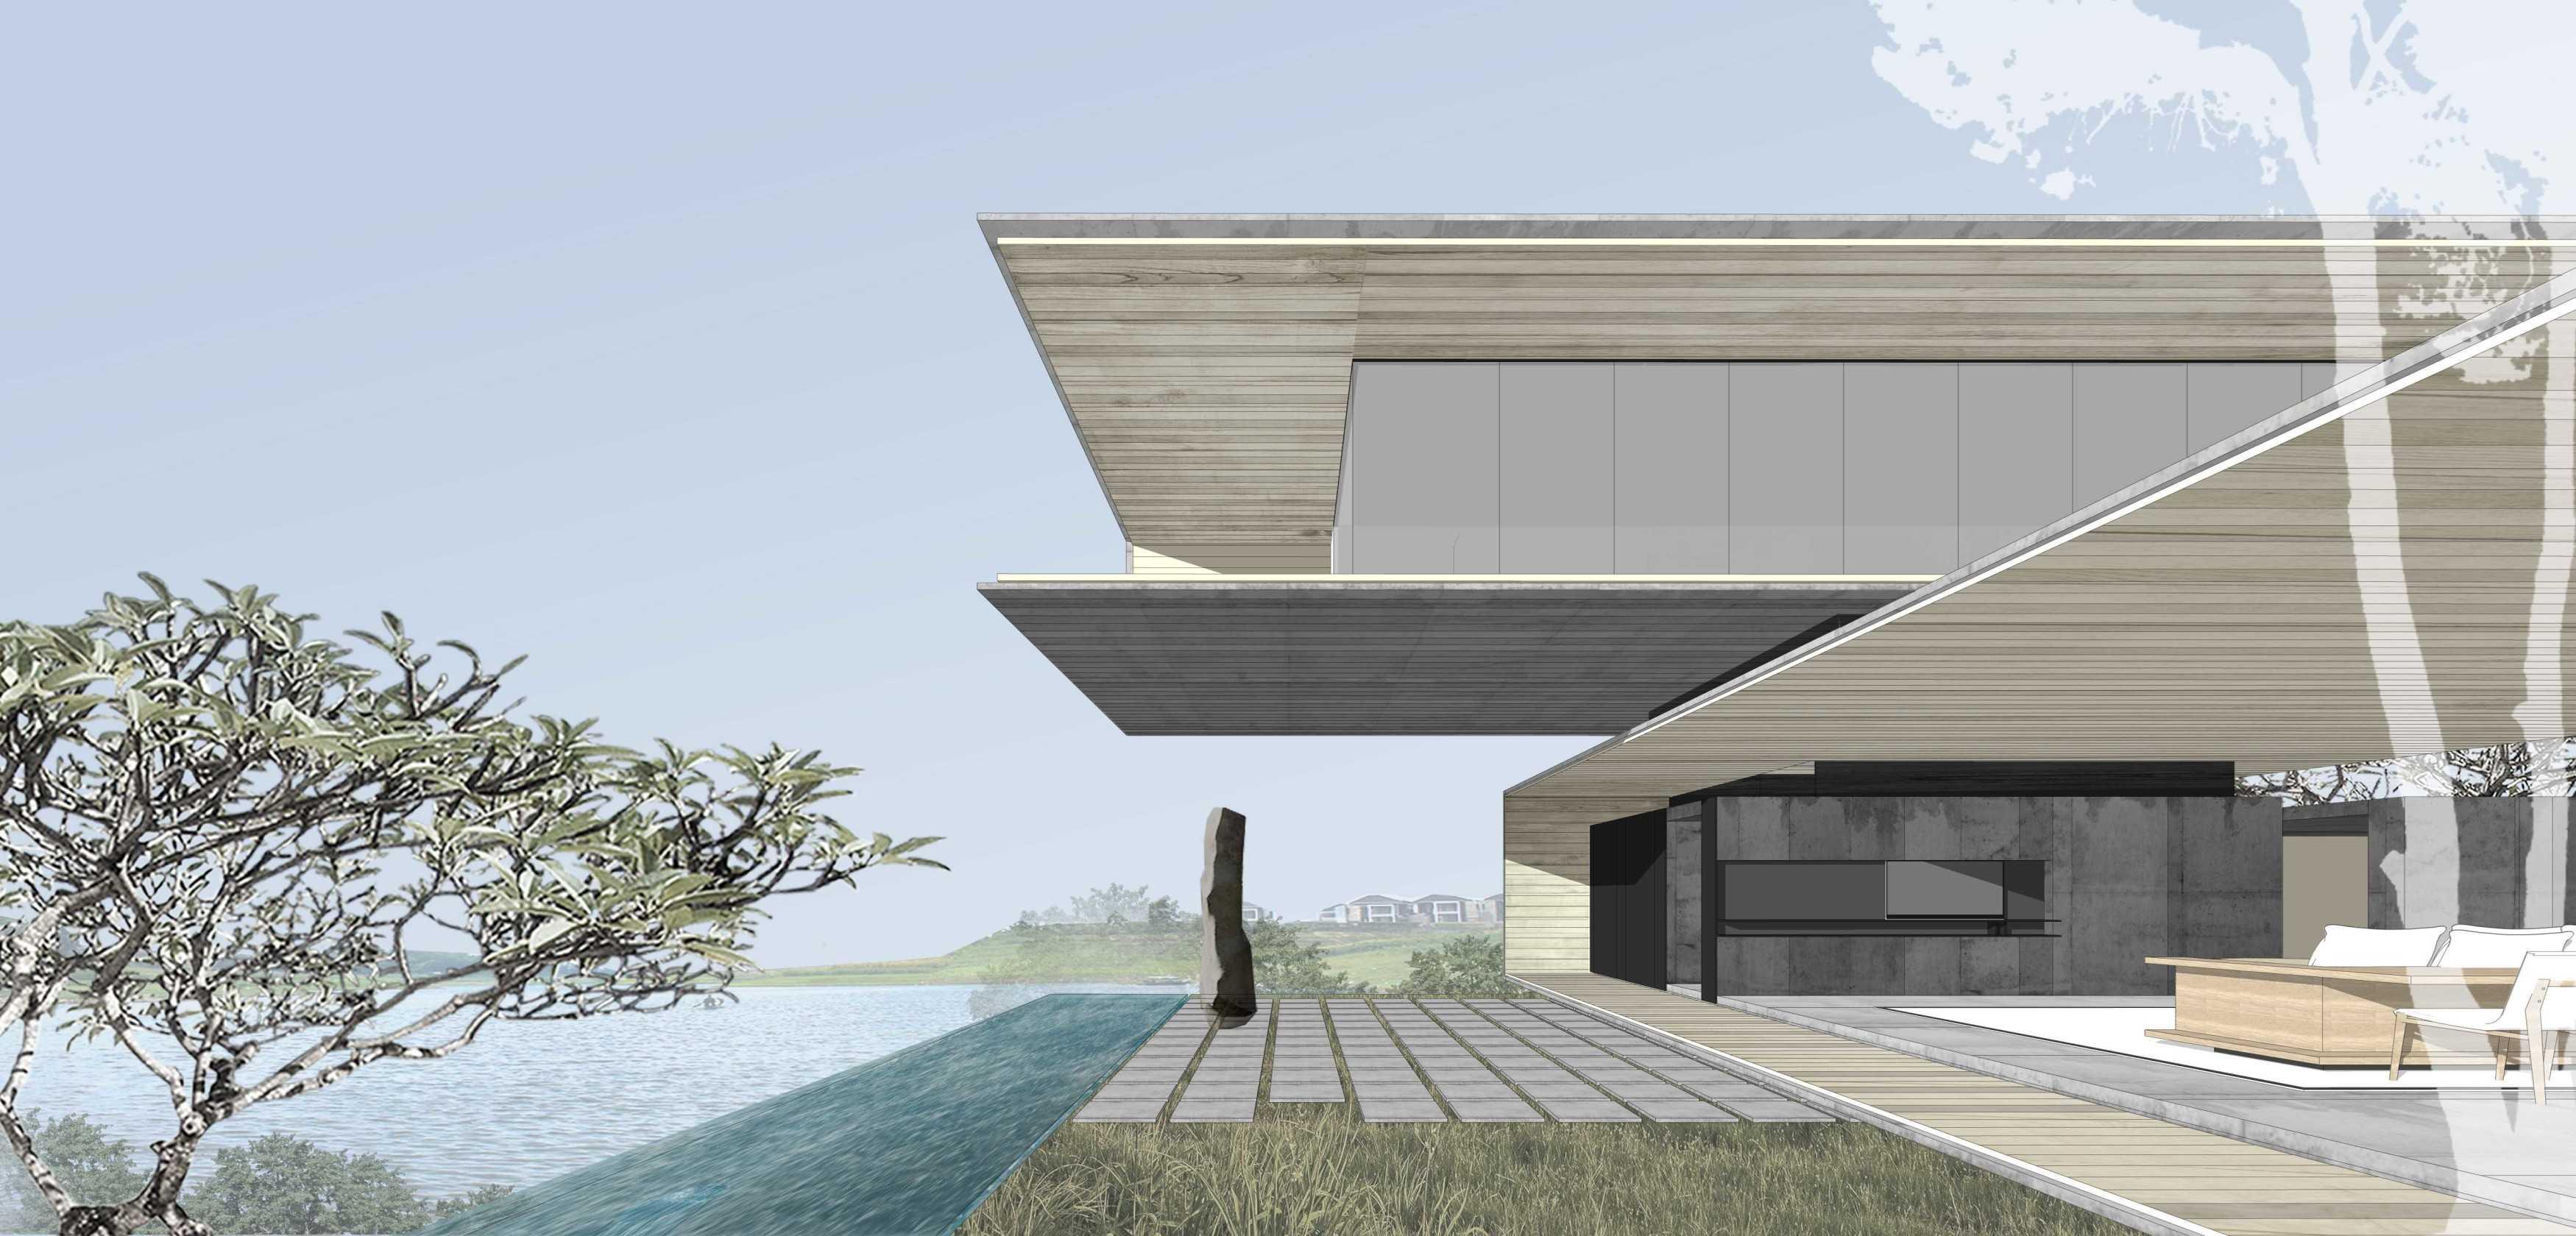 Eben Lake House In West Java Kota Baru Parahyangan Kota Baru Parahyangan Back-Garden-View Kontemporer  18469